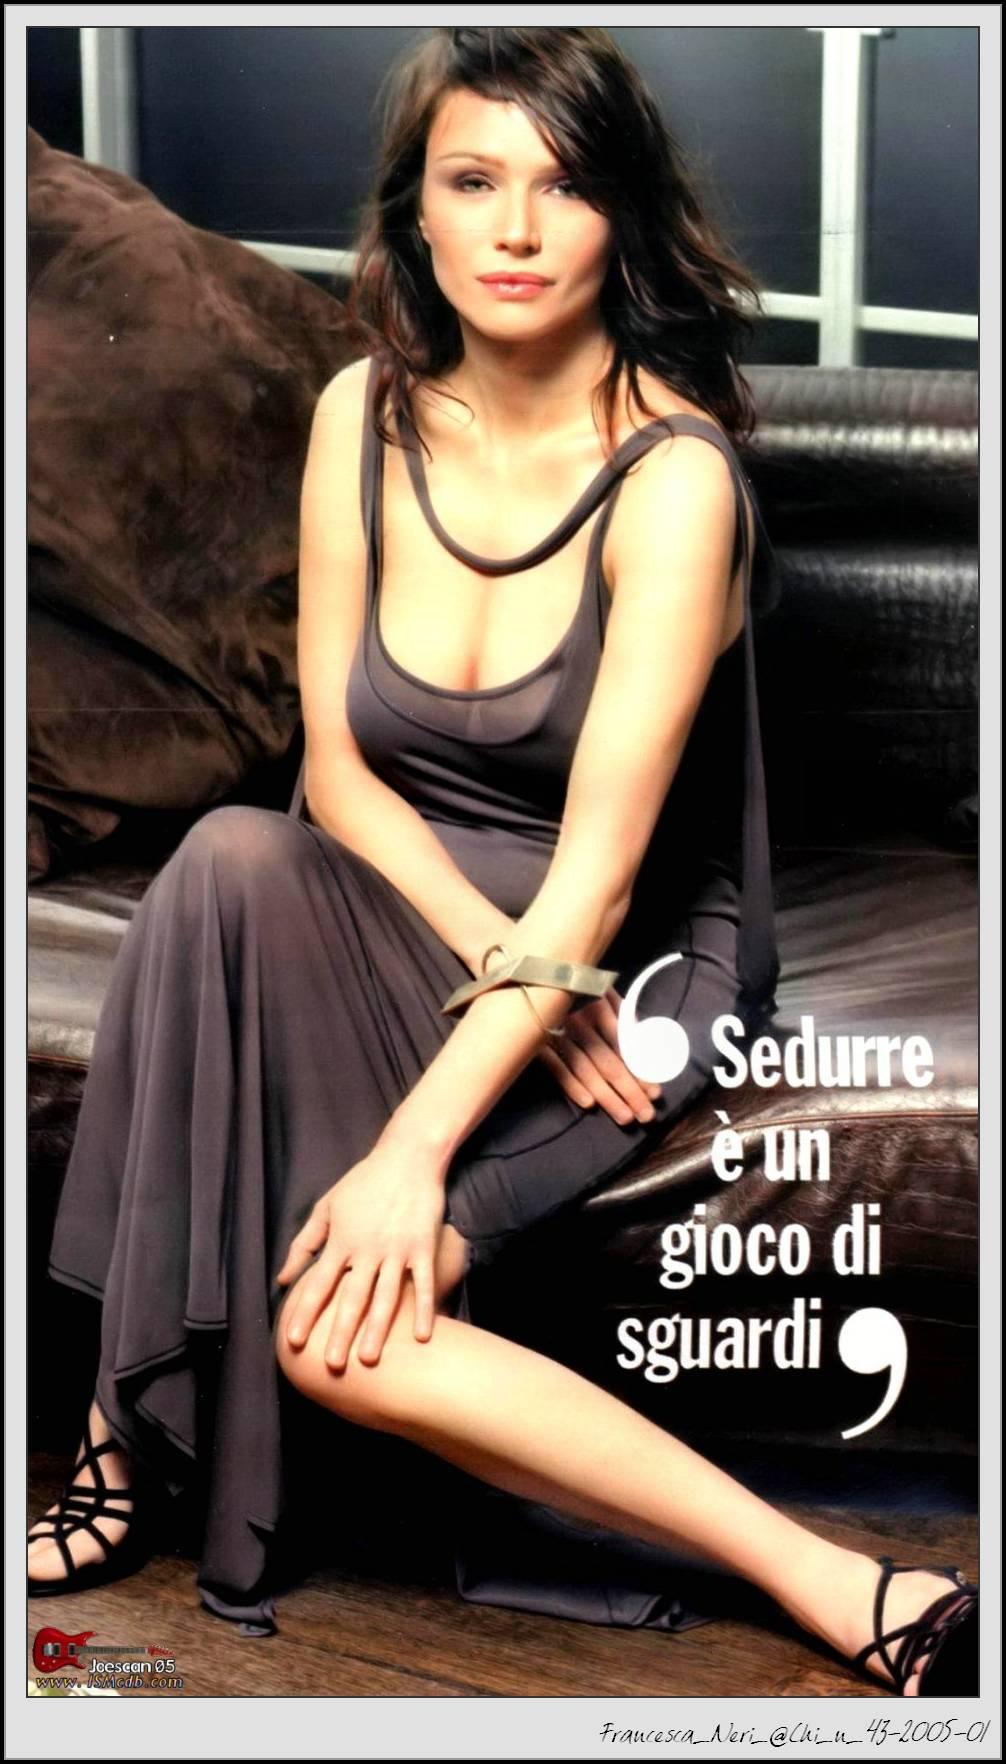 Forum on this topic: Lucia Micarelli, francesca-neri/